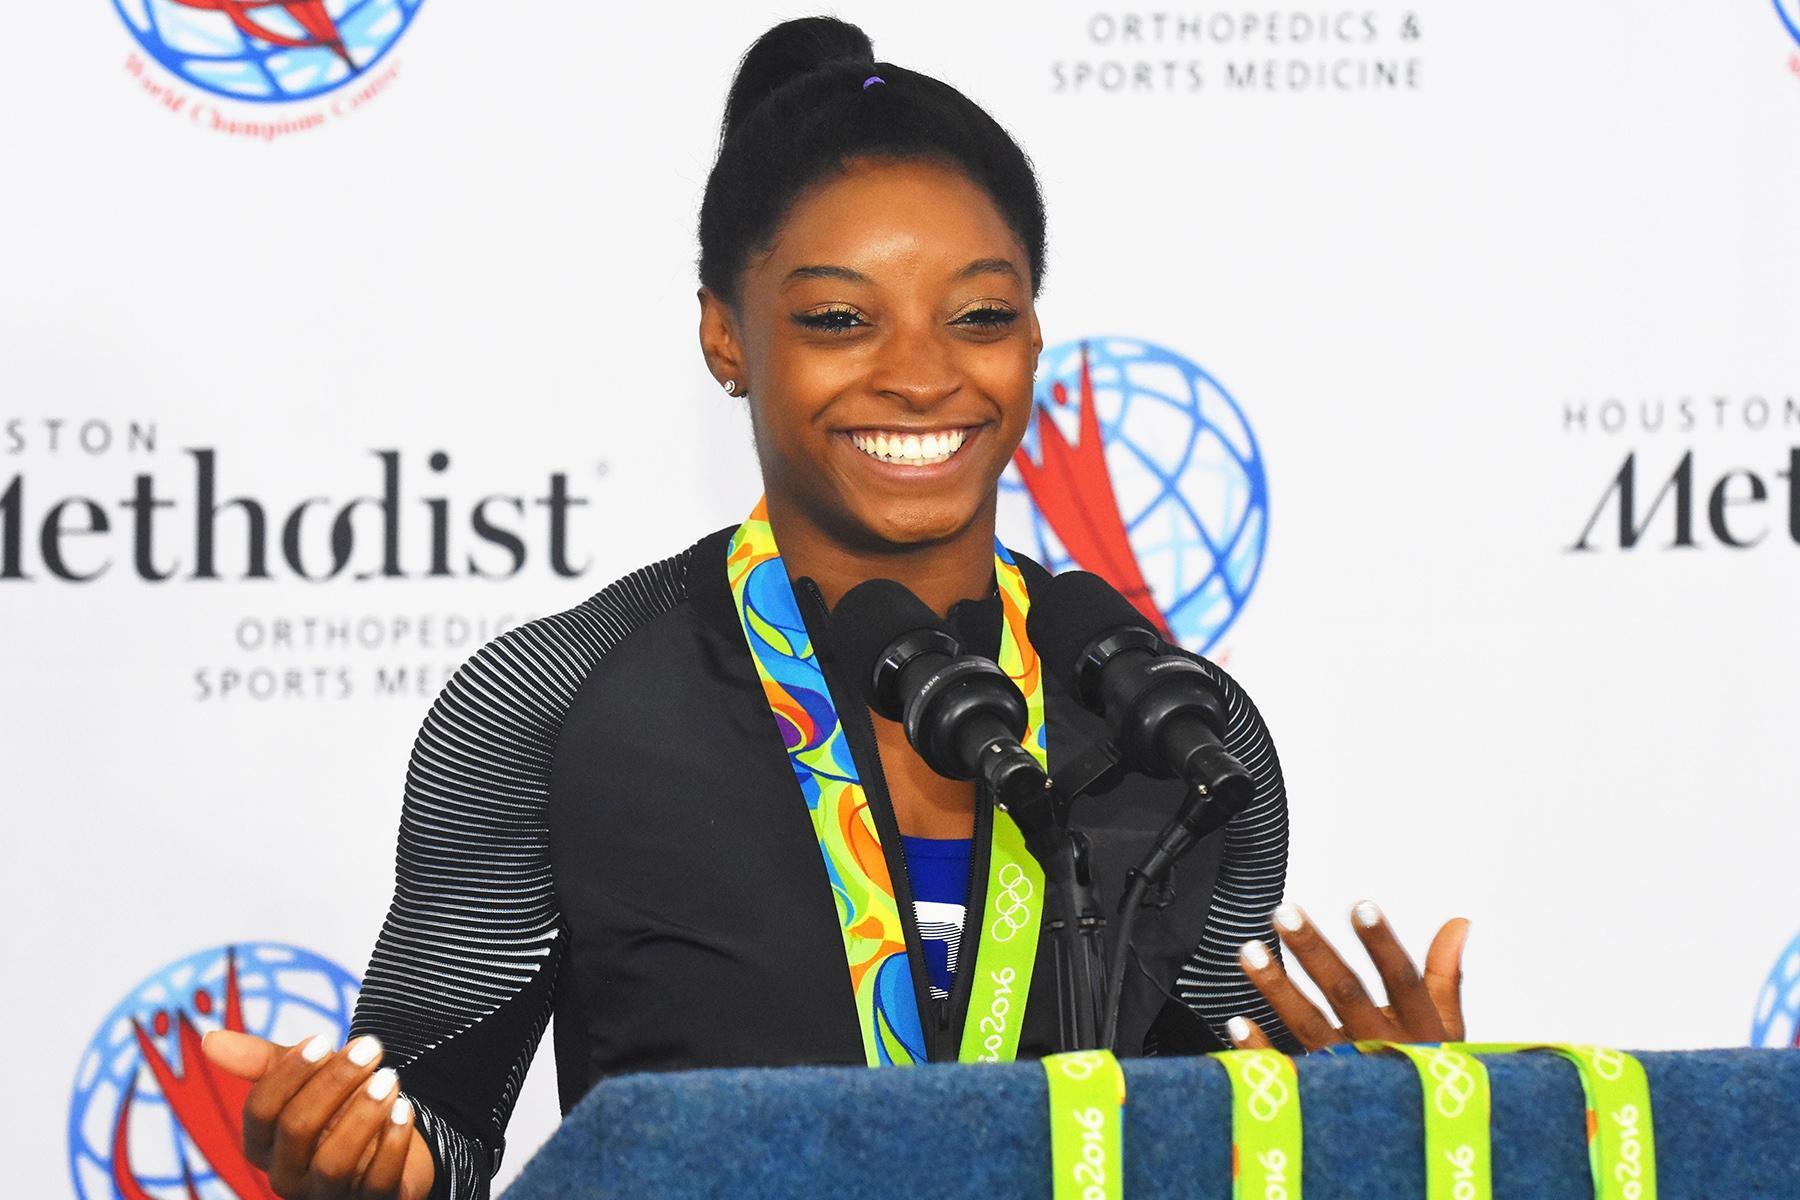 Olympic Star Simone Biles Better Than Ever